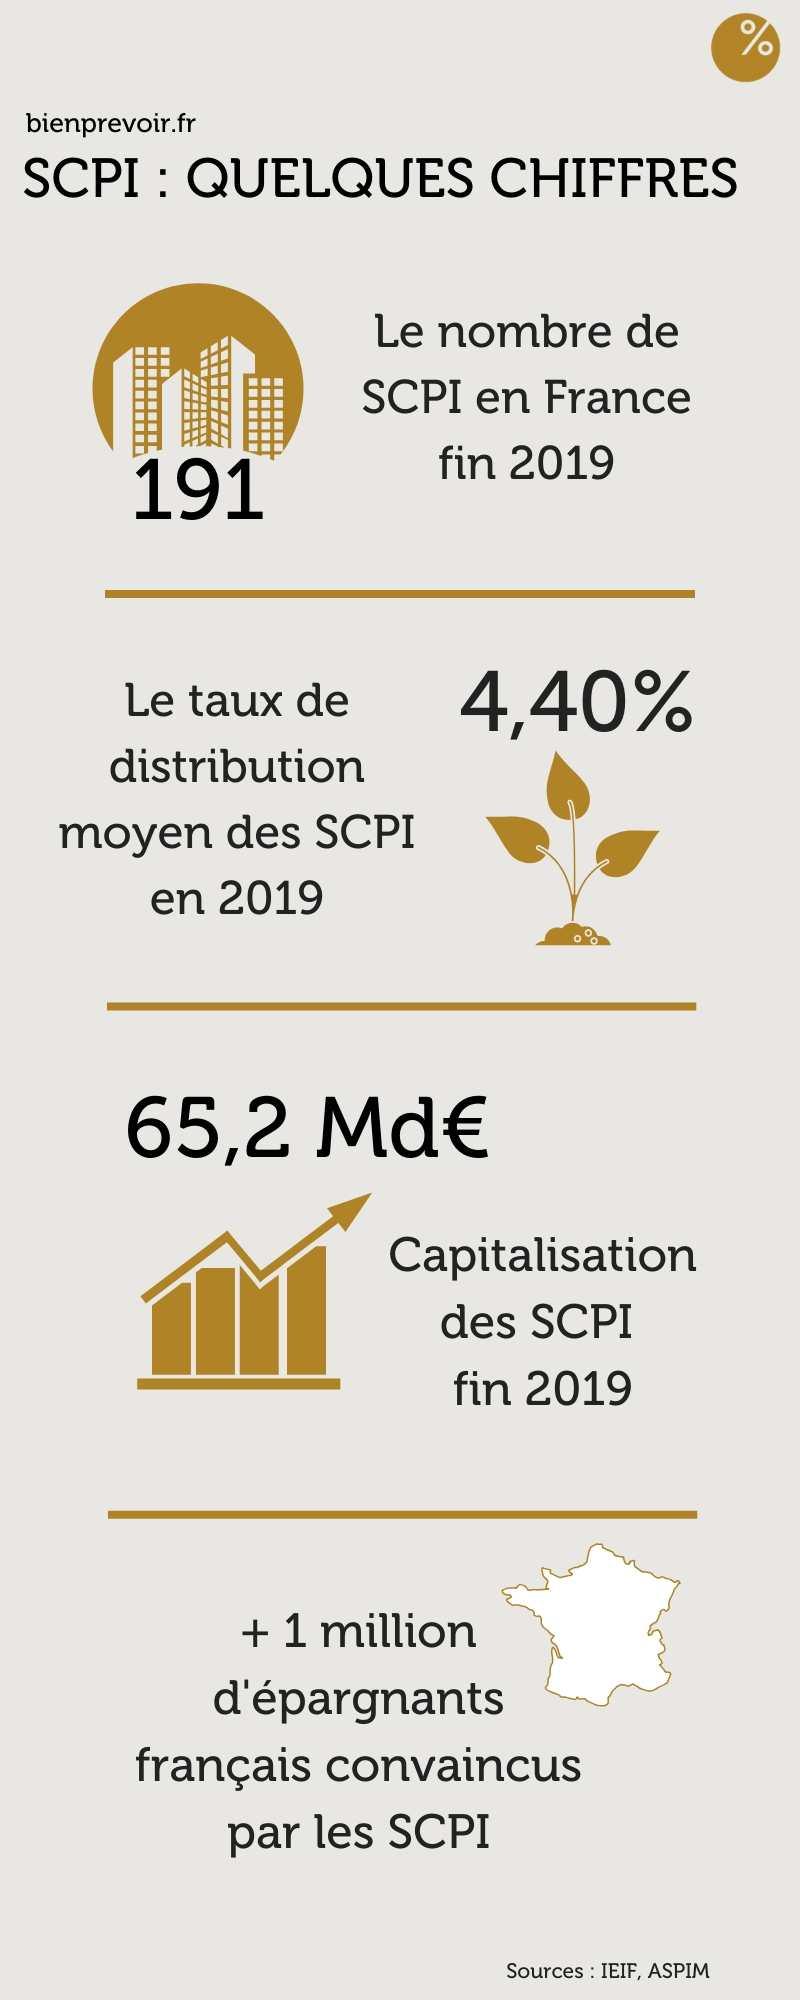 Infographie SCPI bienprevoir.fr